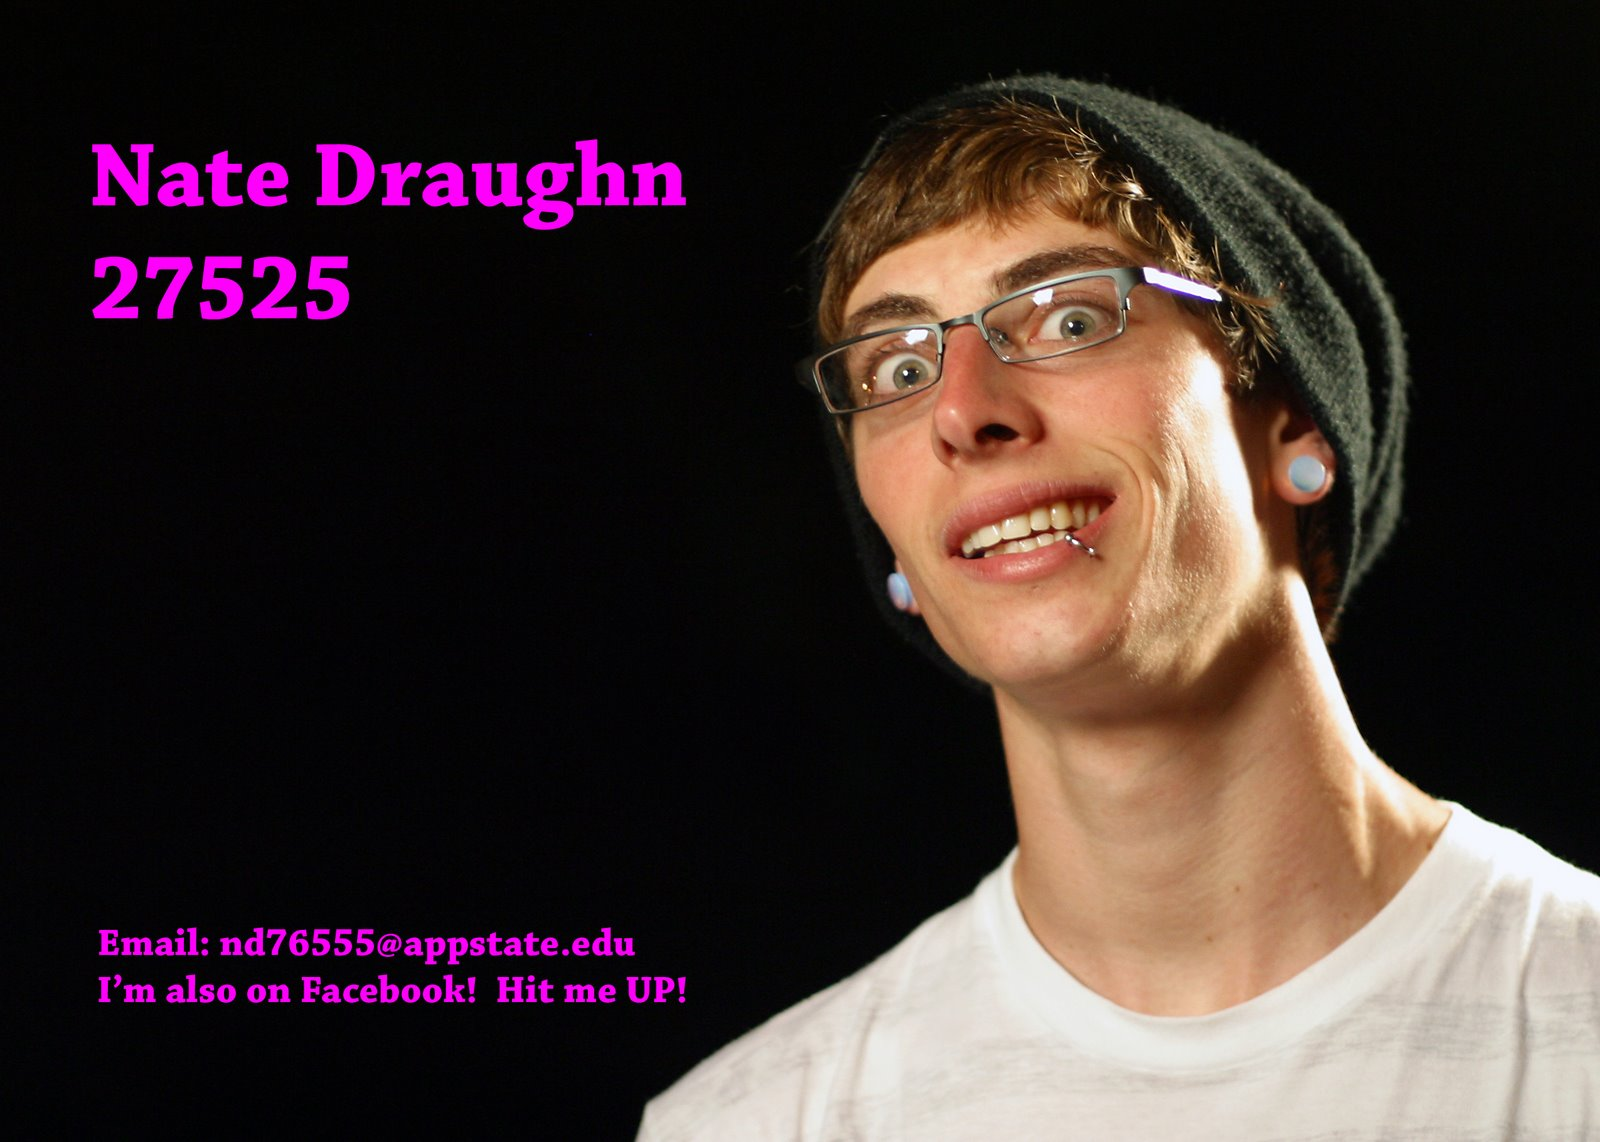 Nate Draughn